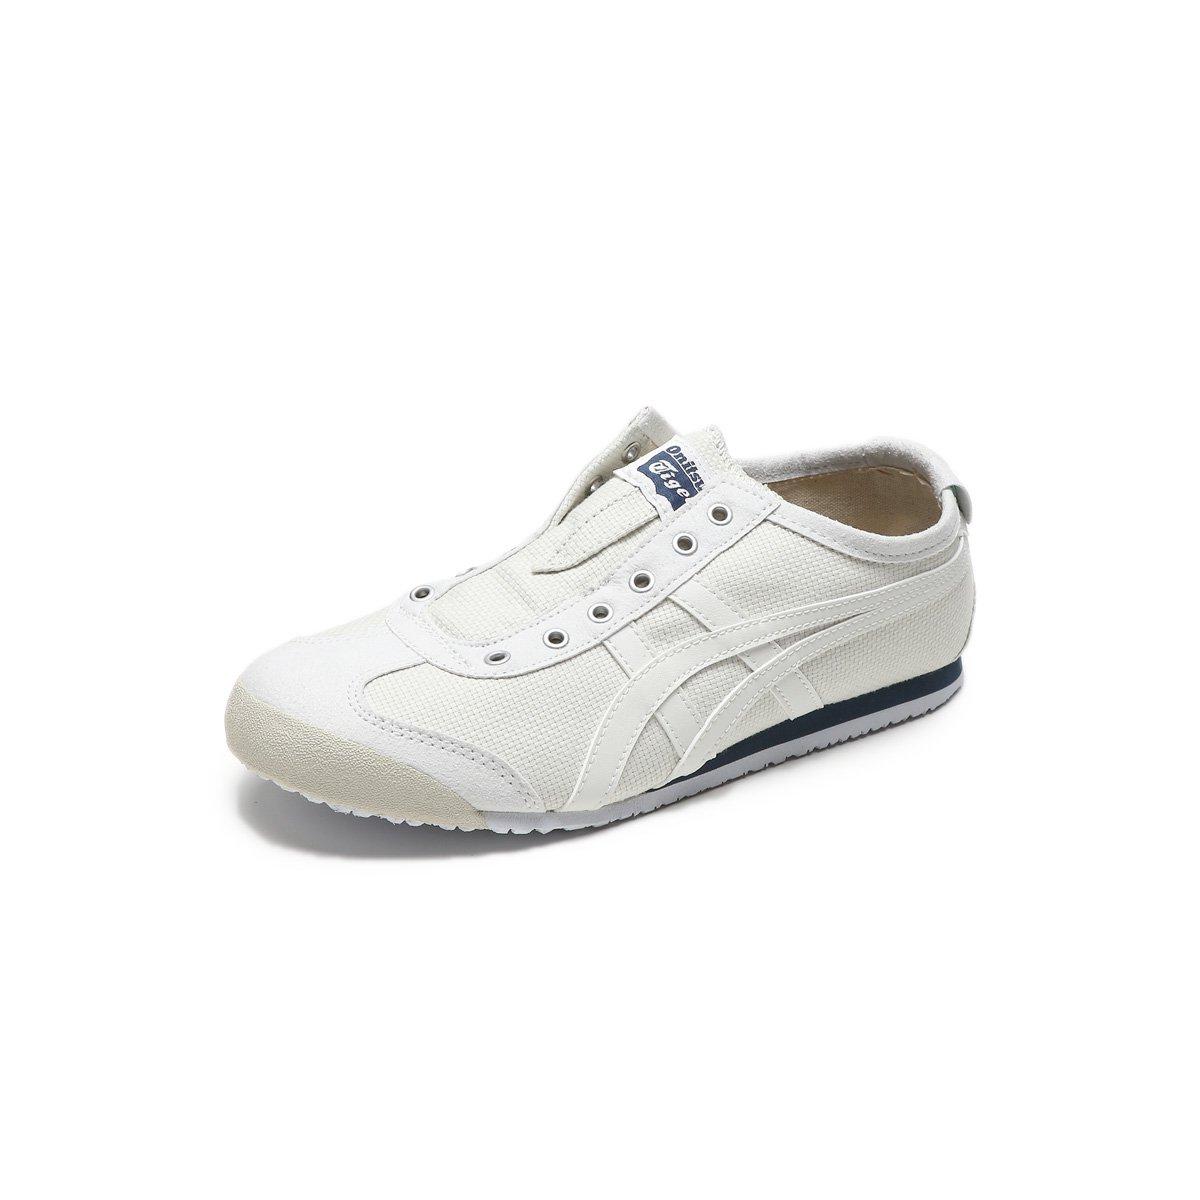 quality design 778ef 41122 ONITSUKA TIGERMEXICO 66 SLIP-ON男女款运动休闲鞋透气平衡D7G0N ...